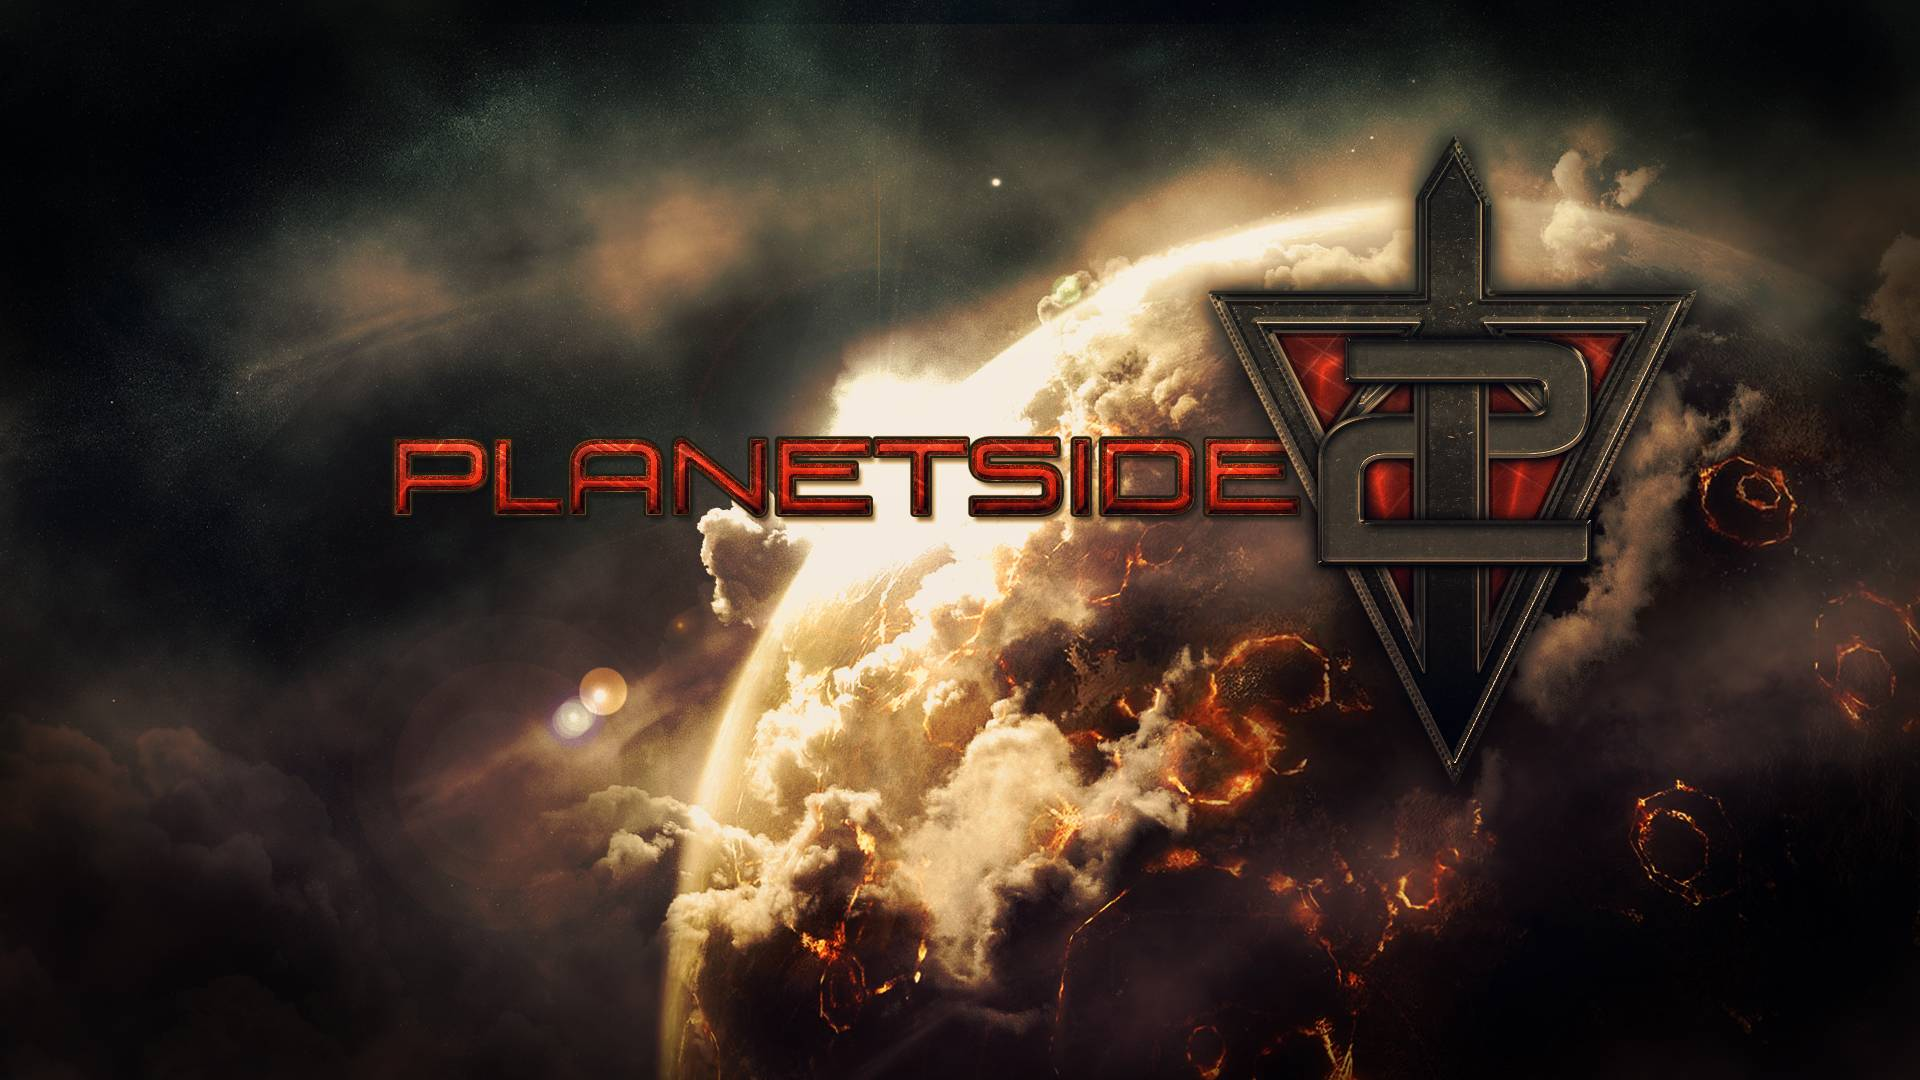 Planetside-2-hd-wallpaper